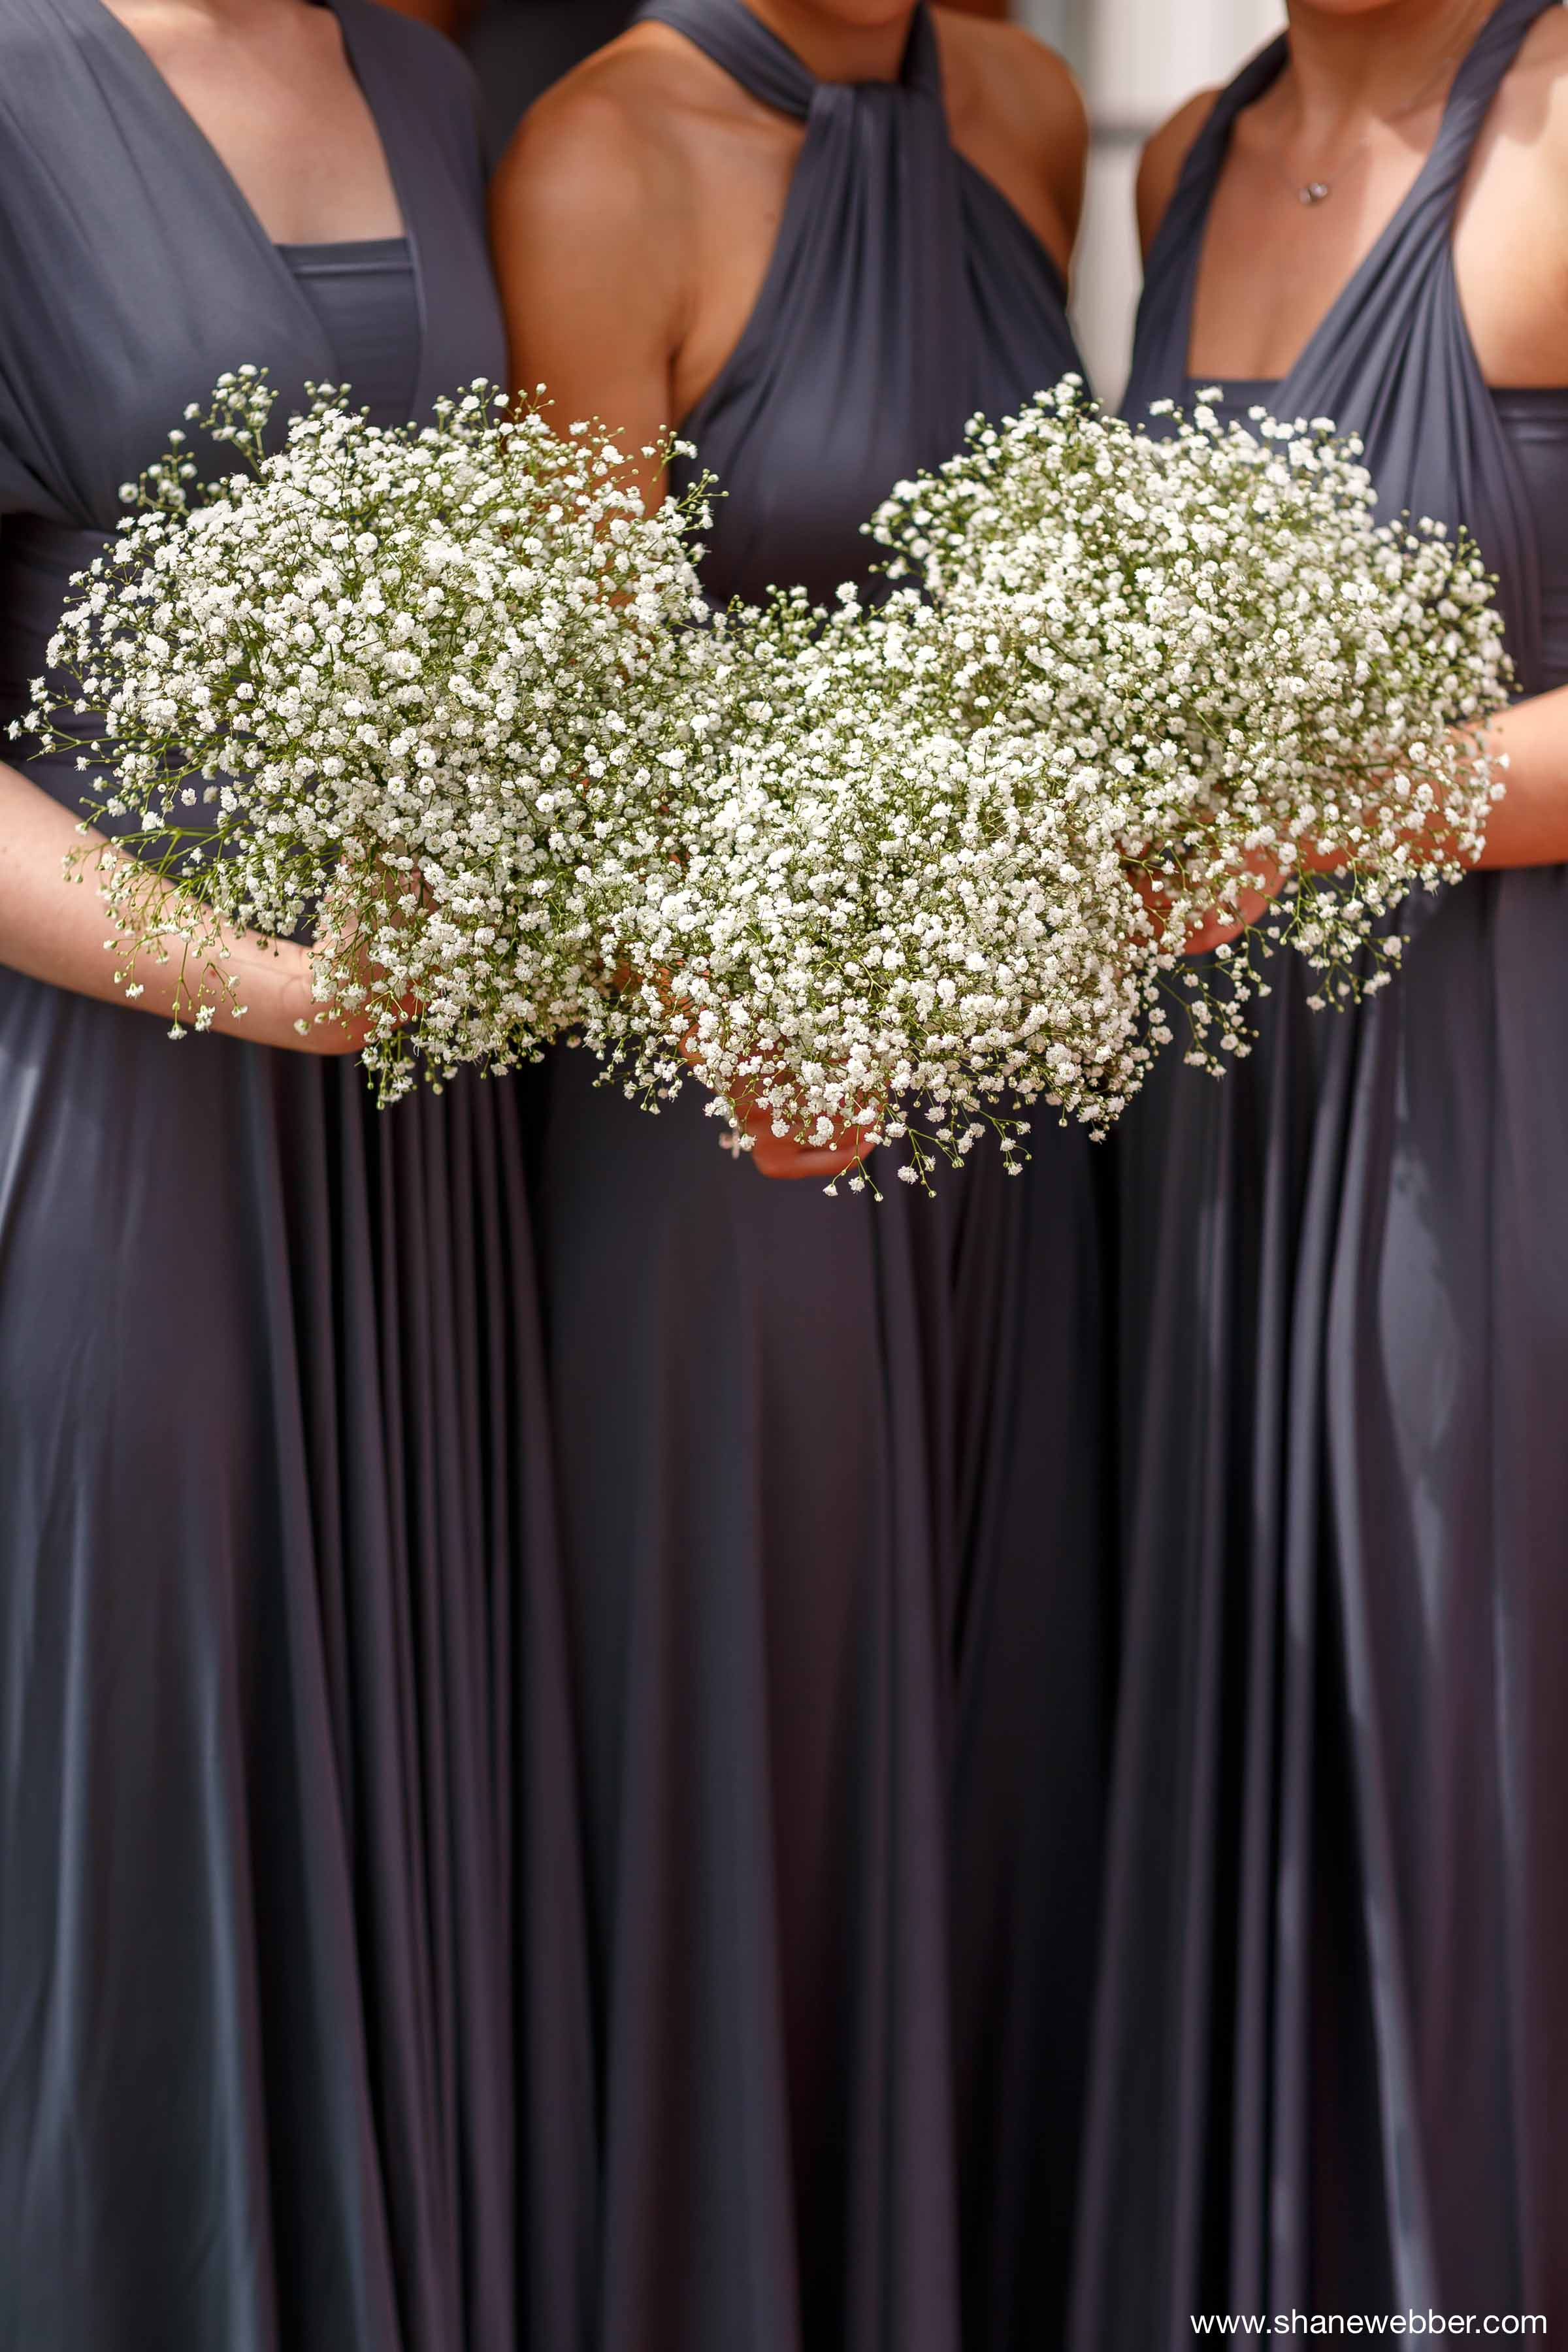 Bridesmaids white bouquets